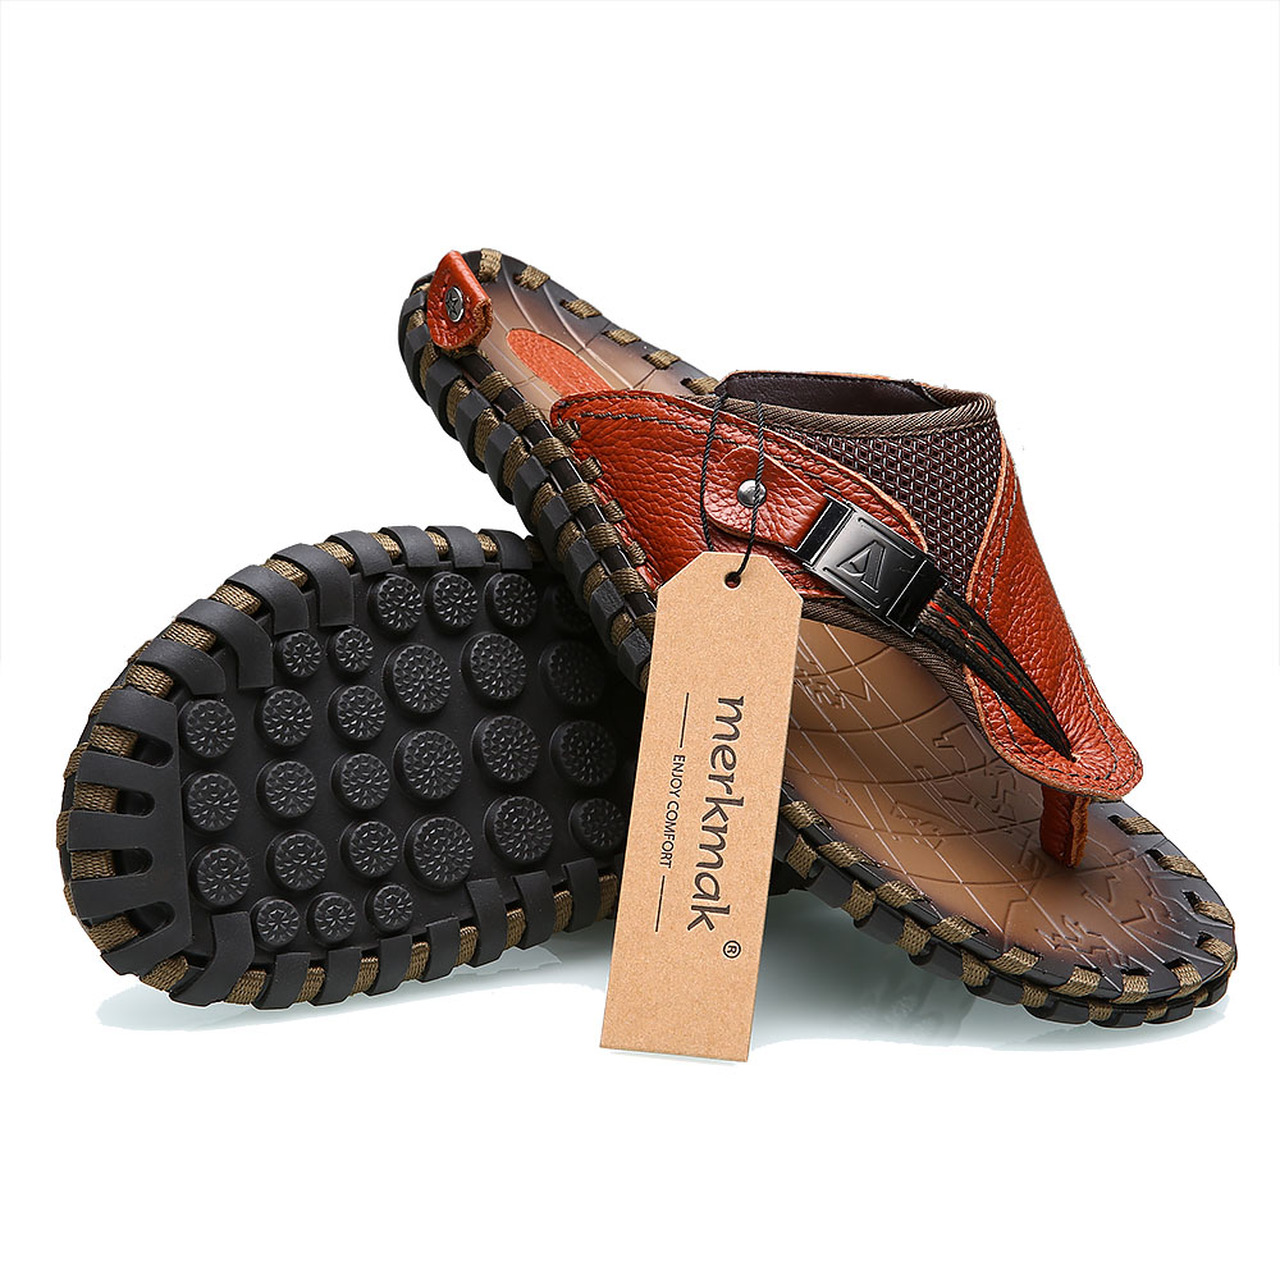 05a8e489ae12 ... Merkmak Luxury Brand 2018 New Men s Flip Flops Genuine Leather Slippers  Summer Fashion Beach Sandals Shoes ...